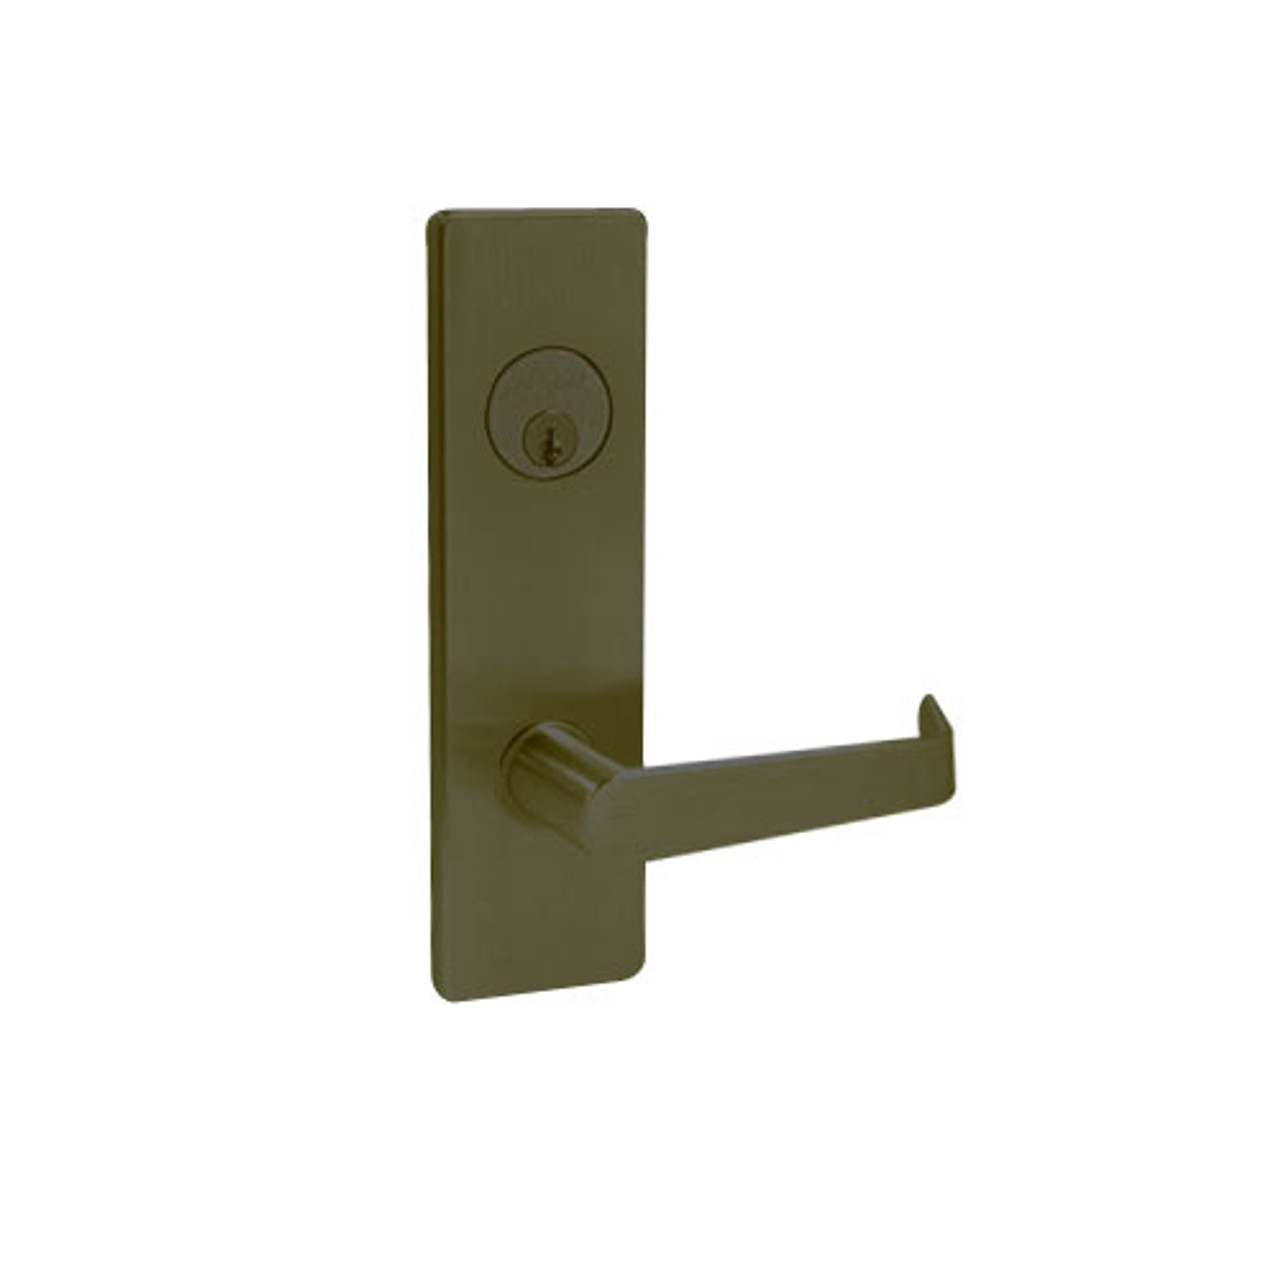 MA431P-DN-613 Falcon Mortise Locks MA Series Classroom Security with  deadbolt DN Lever with Escutcheon Style in Oil Rubbed Bronze